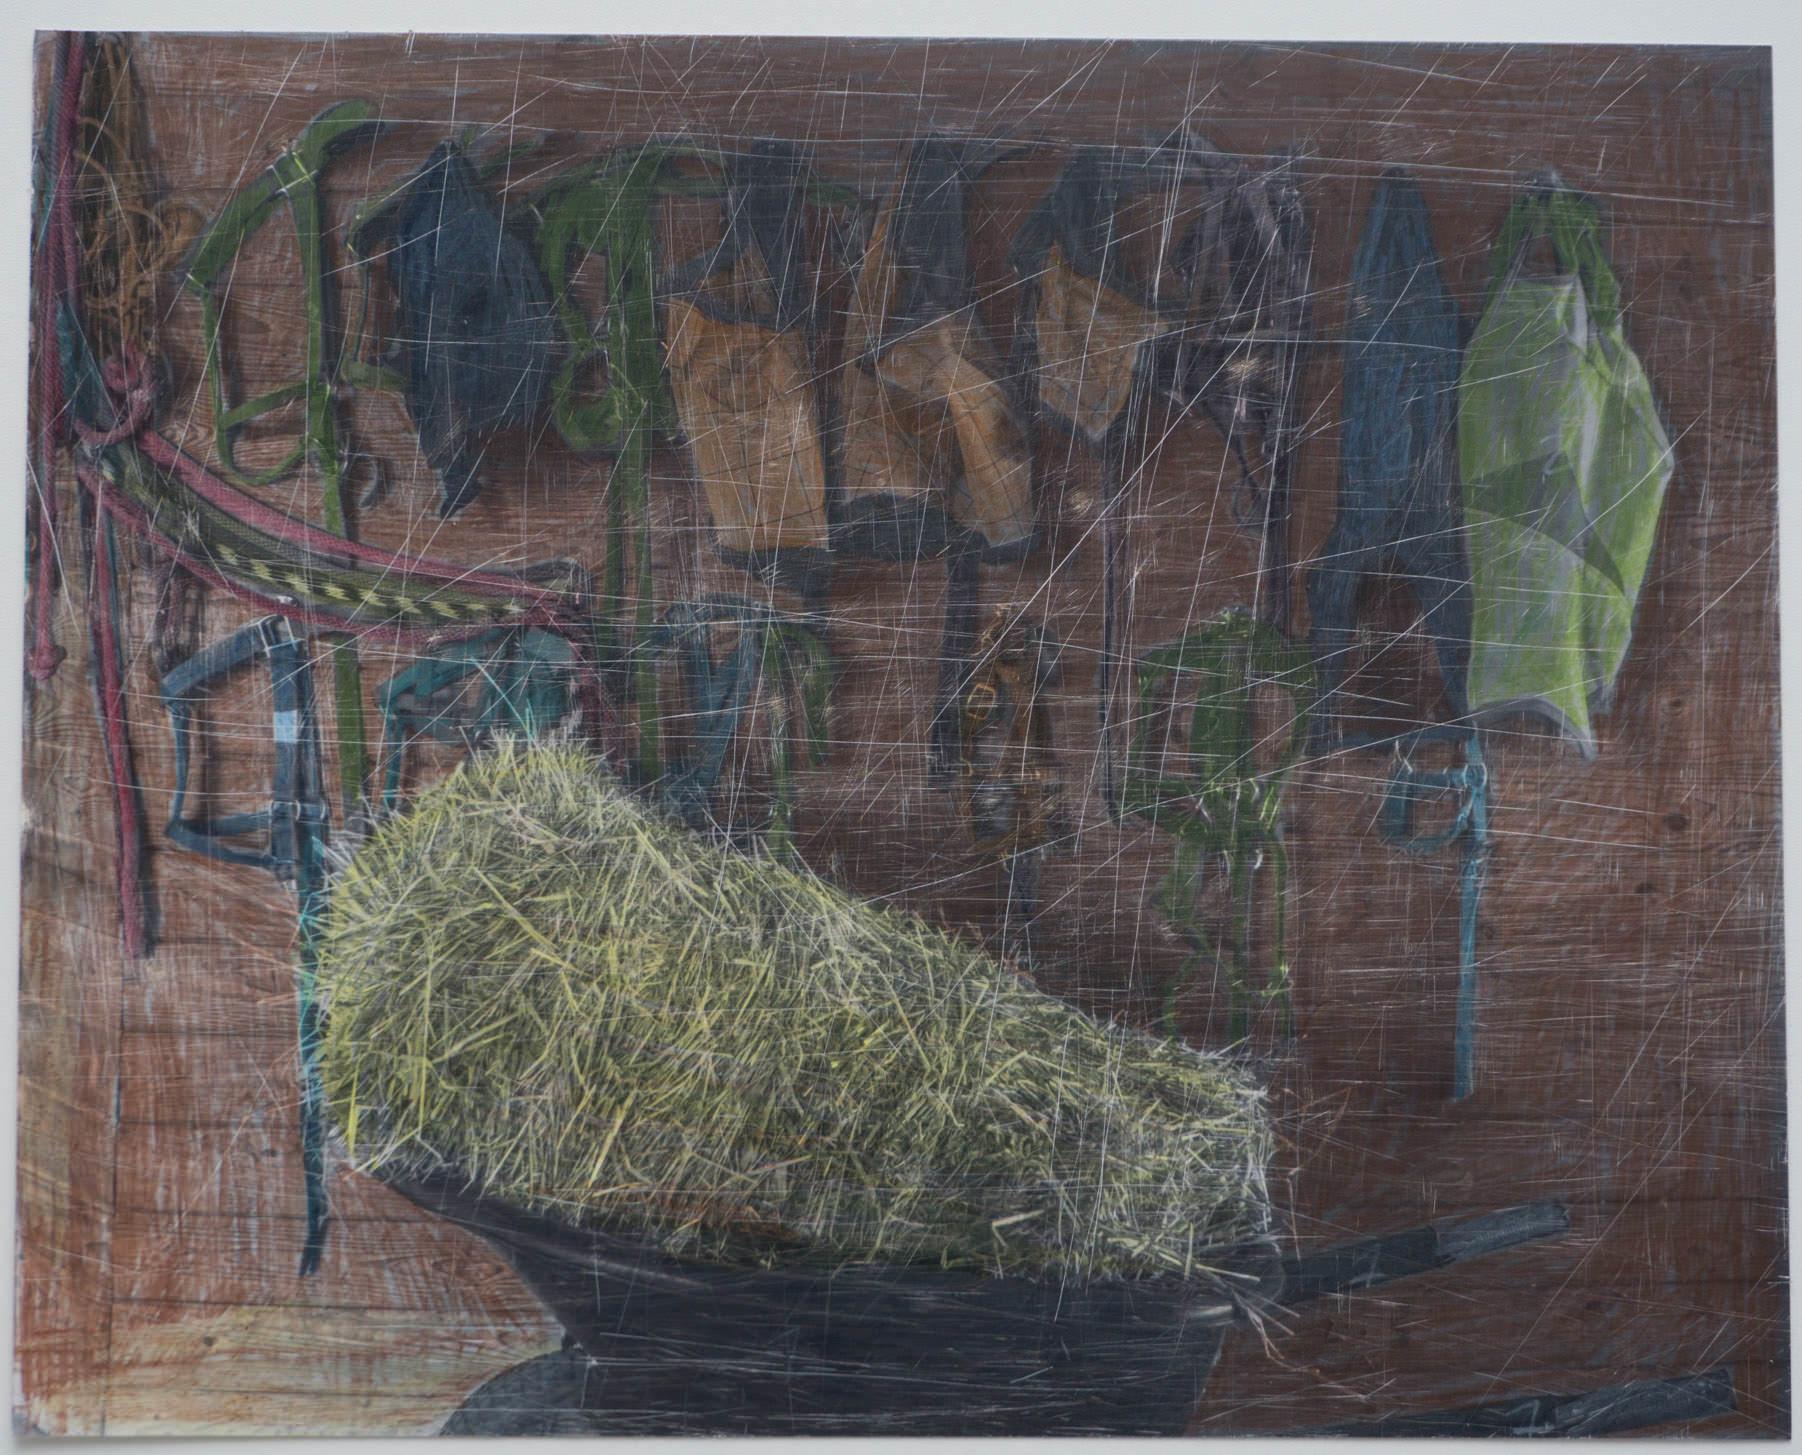 BW Hay  (8x10 - sanded print - pencil